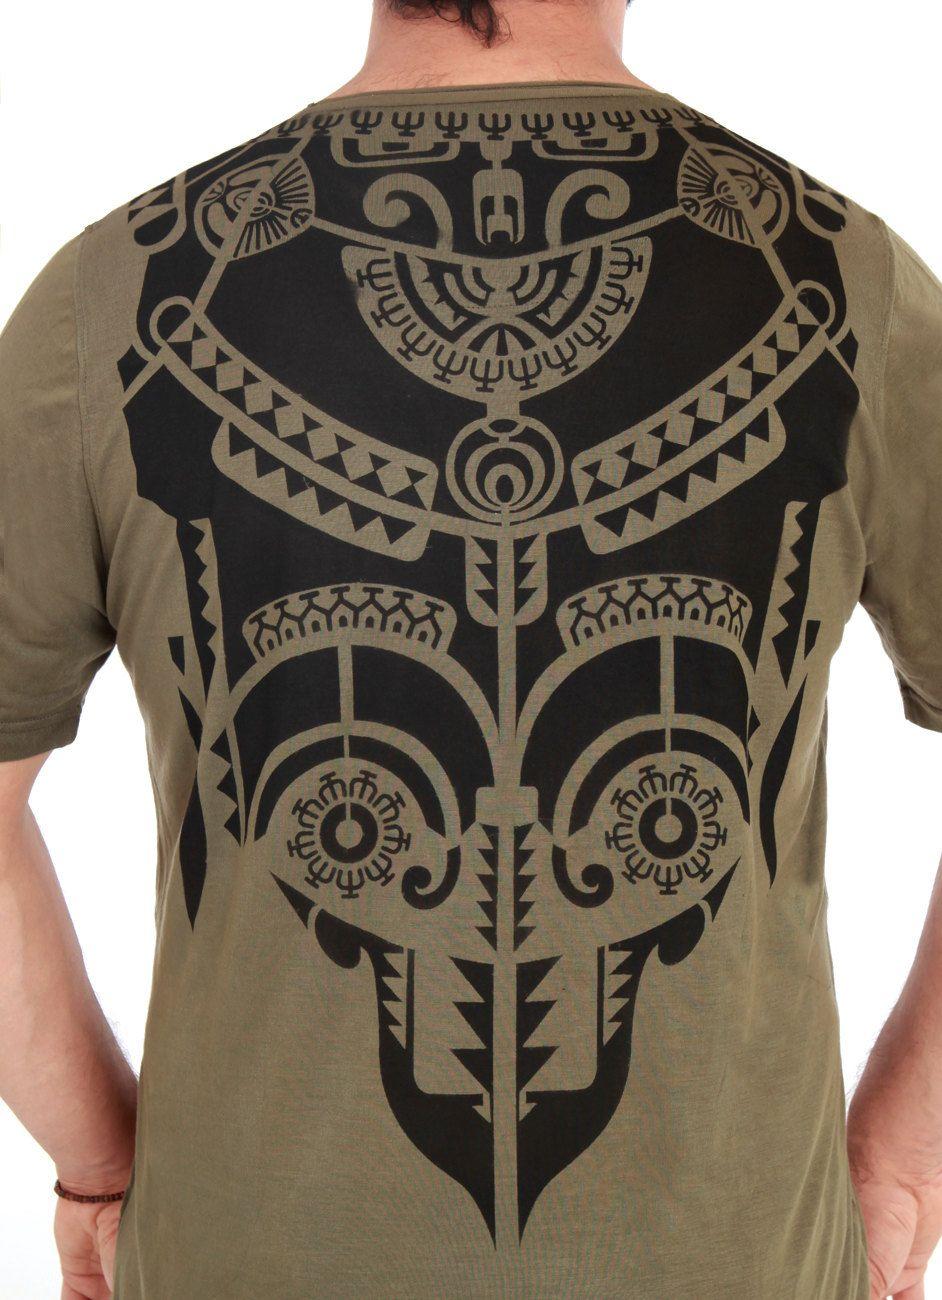 cc3f91baf Mens olive green tshirt, hand stenciled Tribal Aztec Tattoo graphic, casual  festival wear. $68.00, via Etsy.